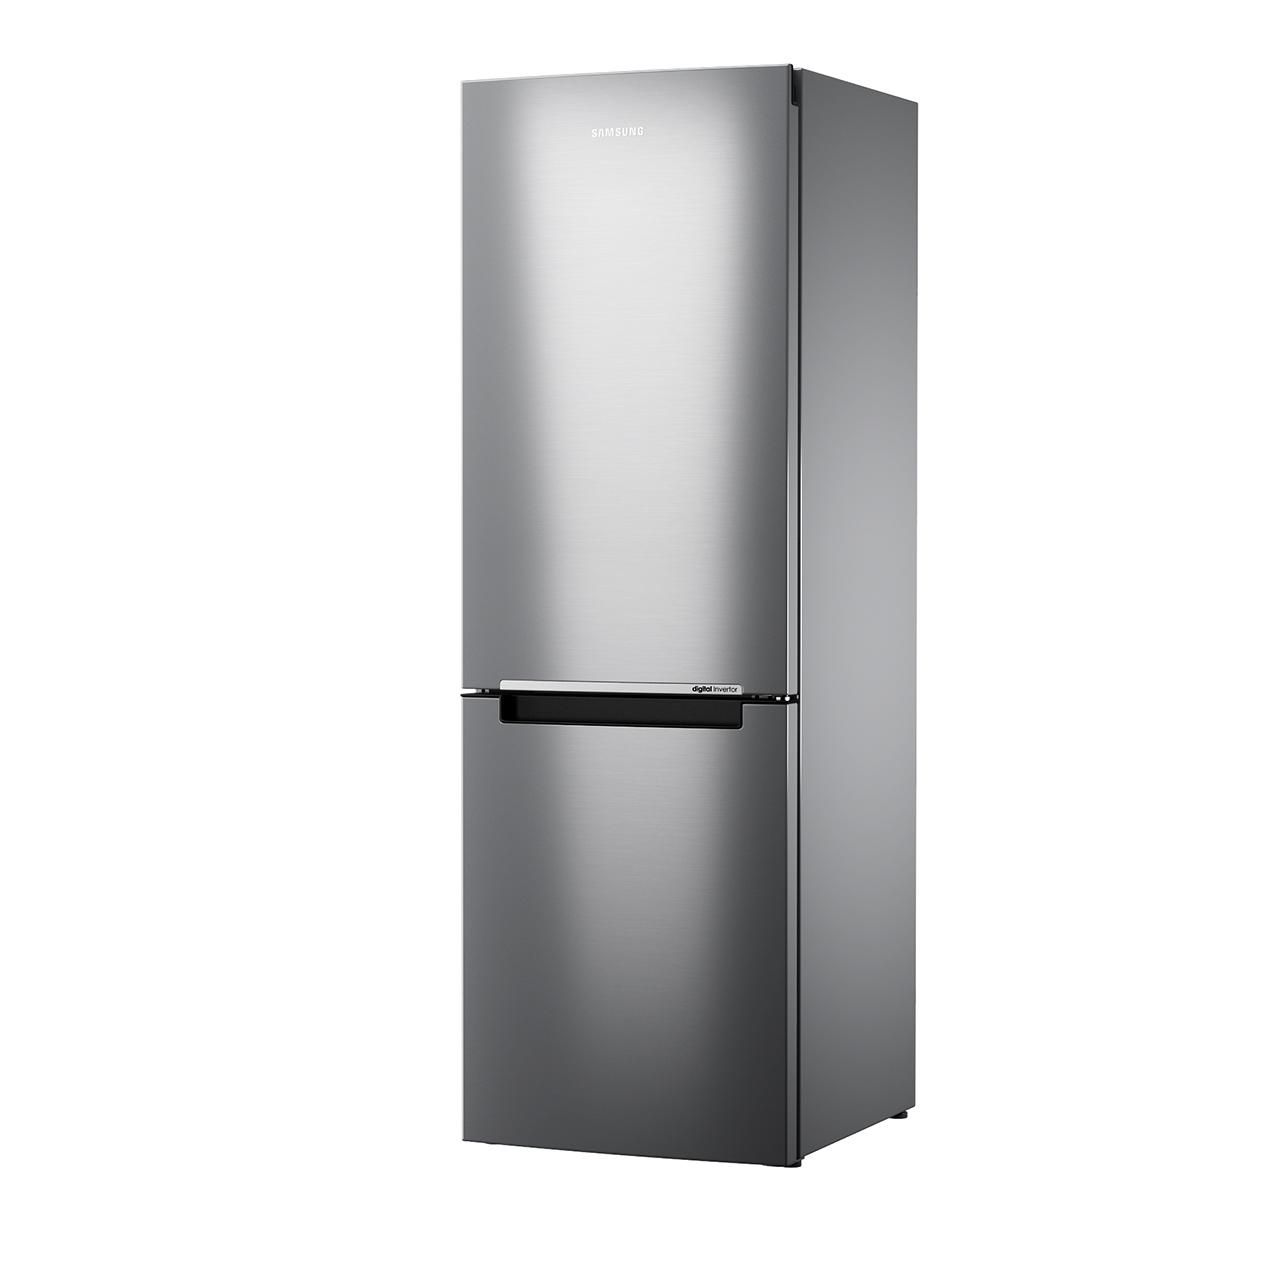 RB3000 Fridge-Freezer 185 cm by Samsung